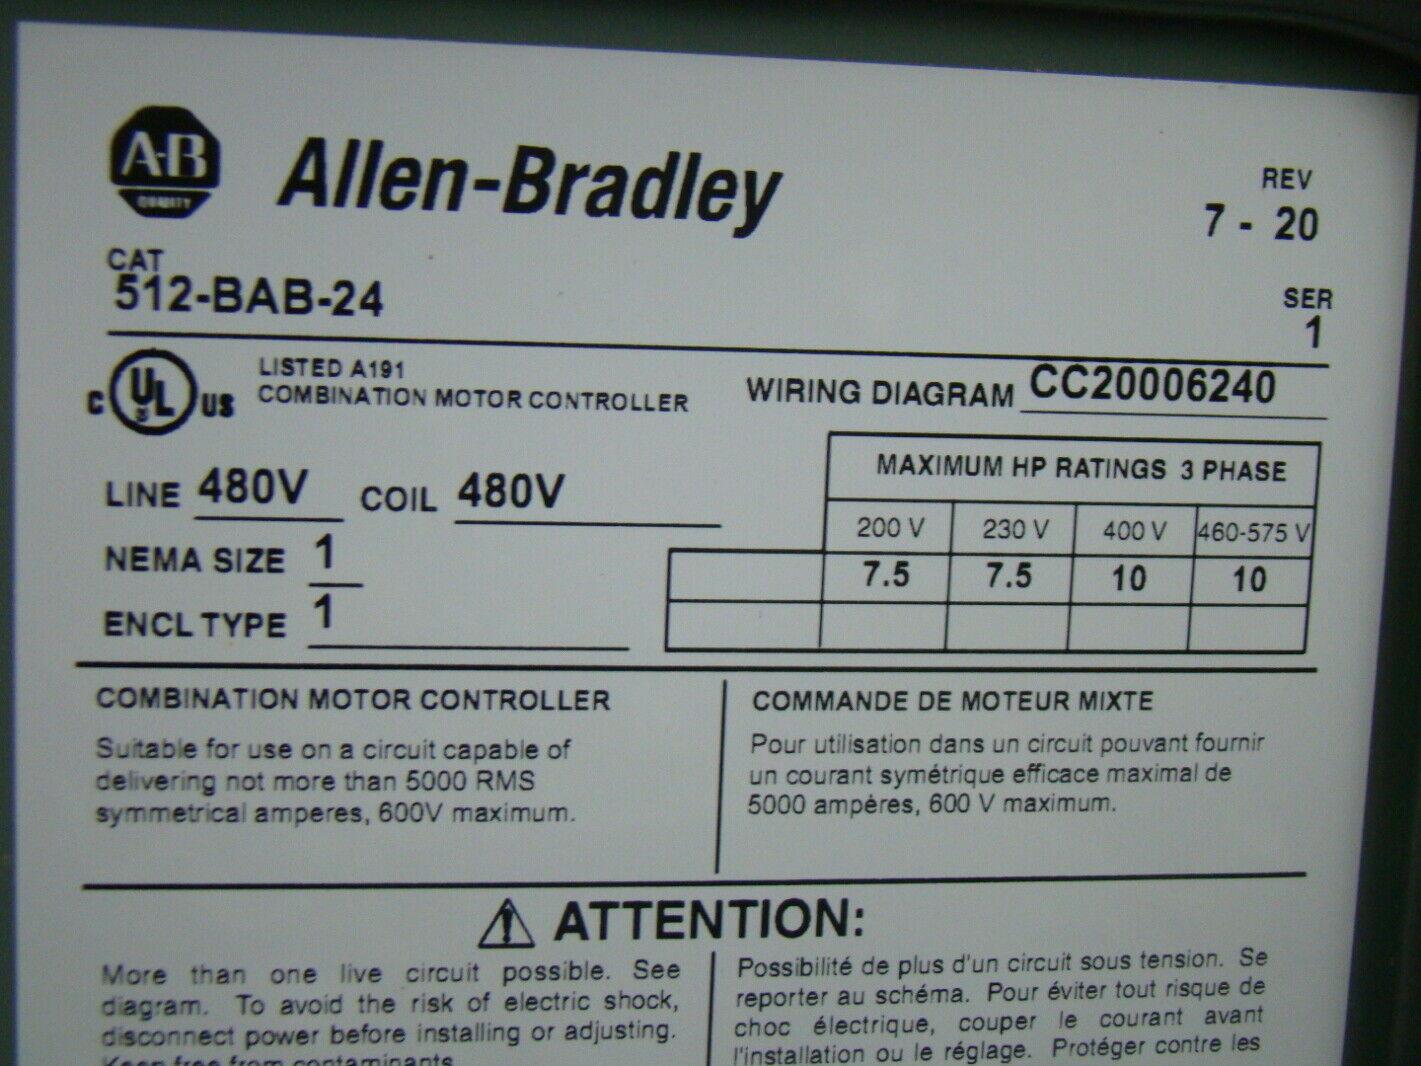 Allen Bradley 512 Combination Starter Wiring Diagram Modern Design Motor 3 Phase Diagrams 480v Size 1 Bab 24 Rh Fazziosurplus Com Mcc Starters 609u